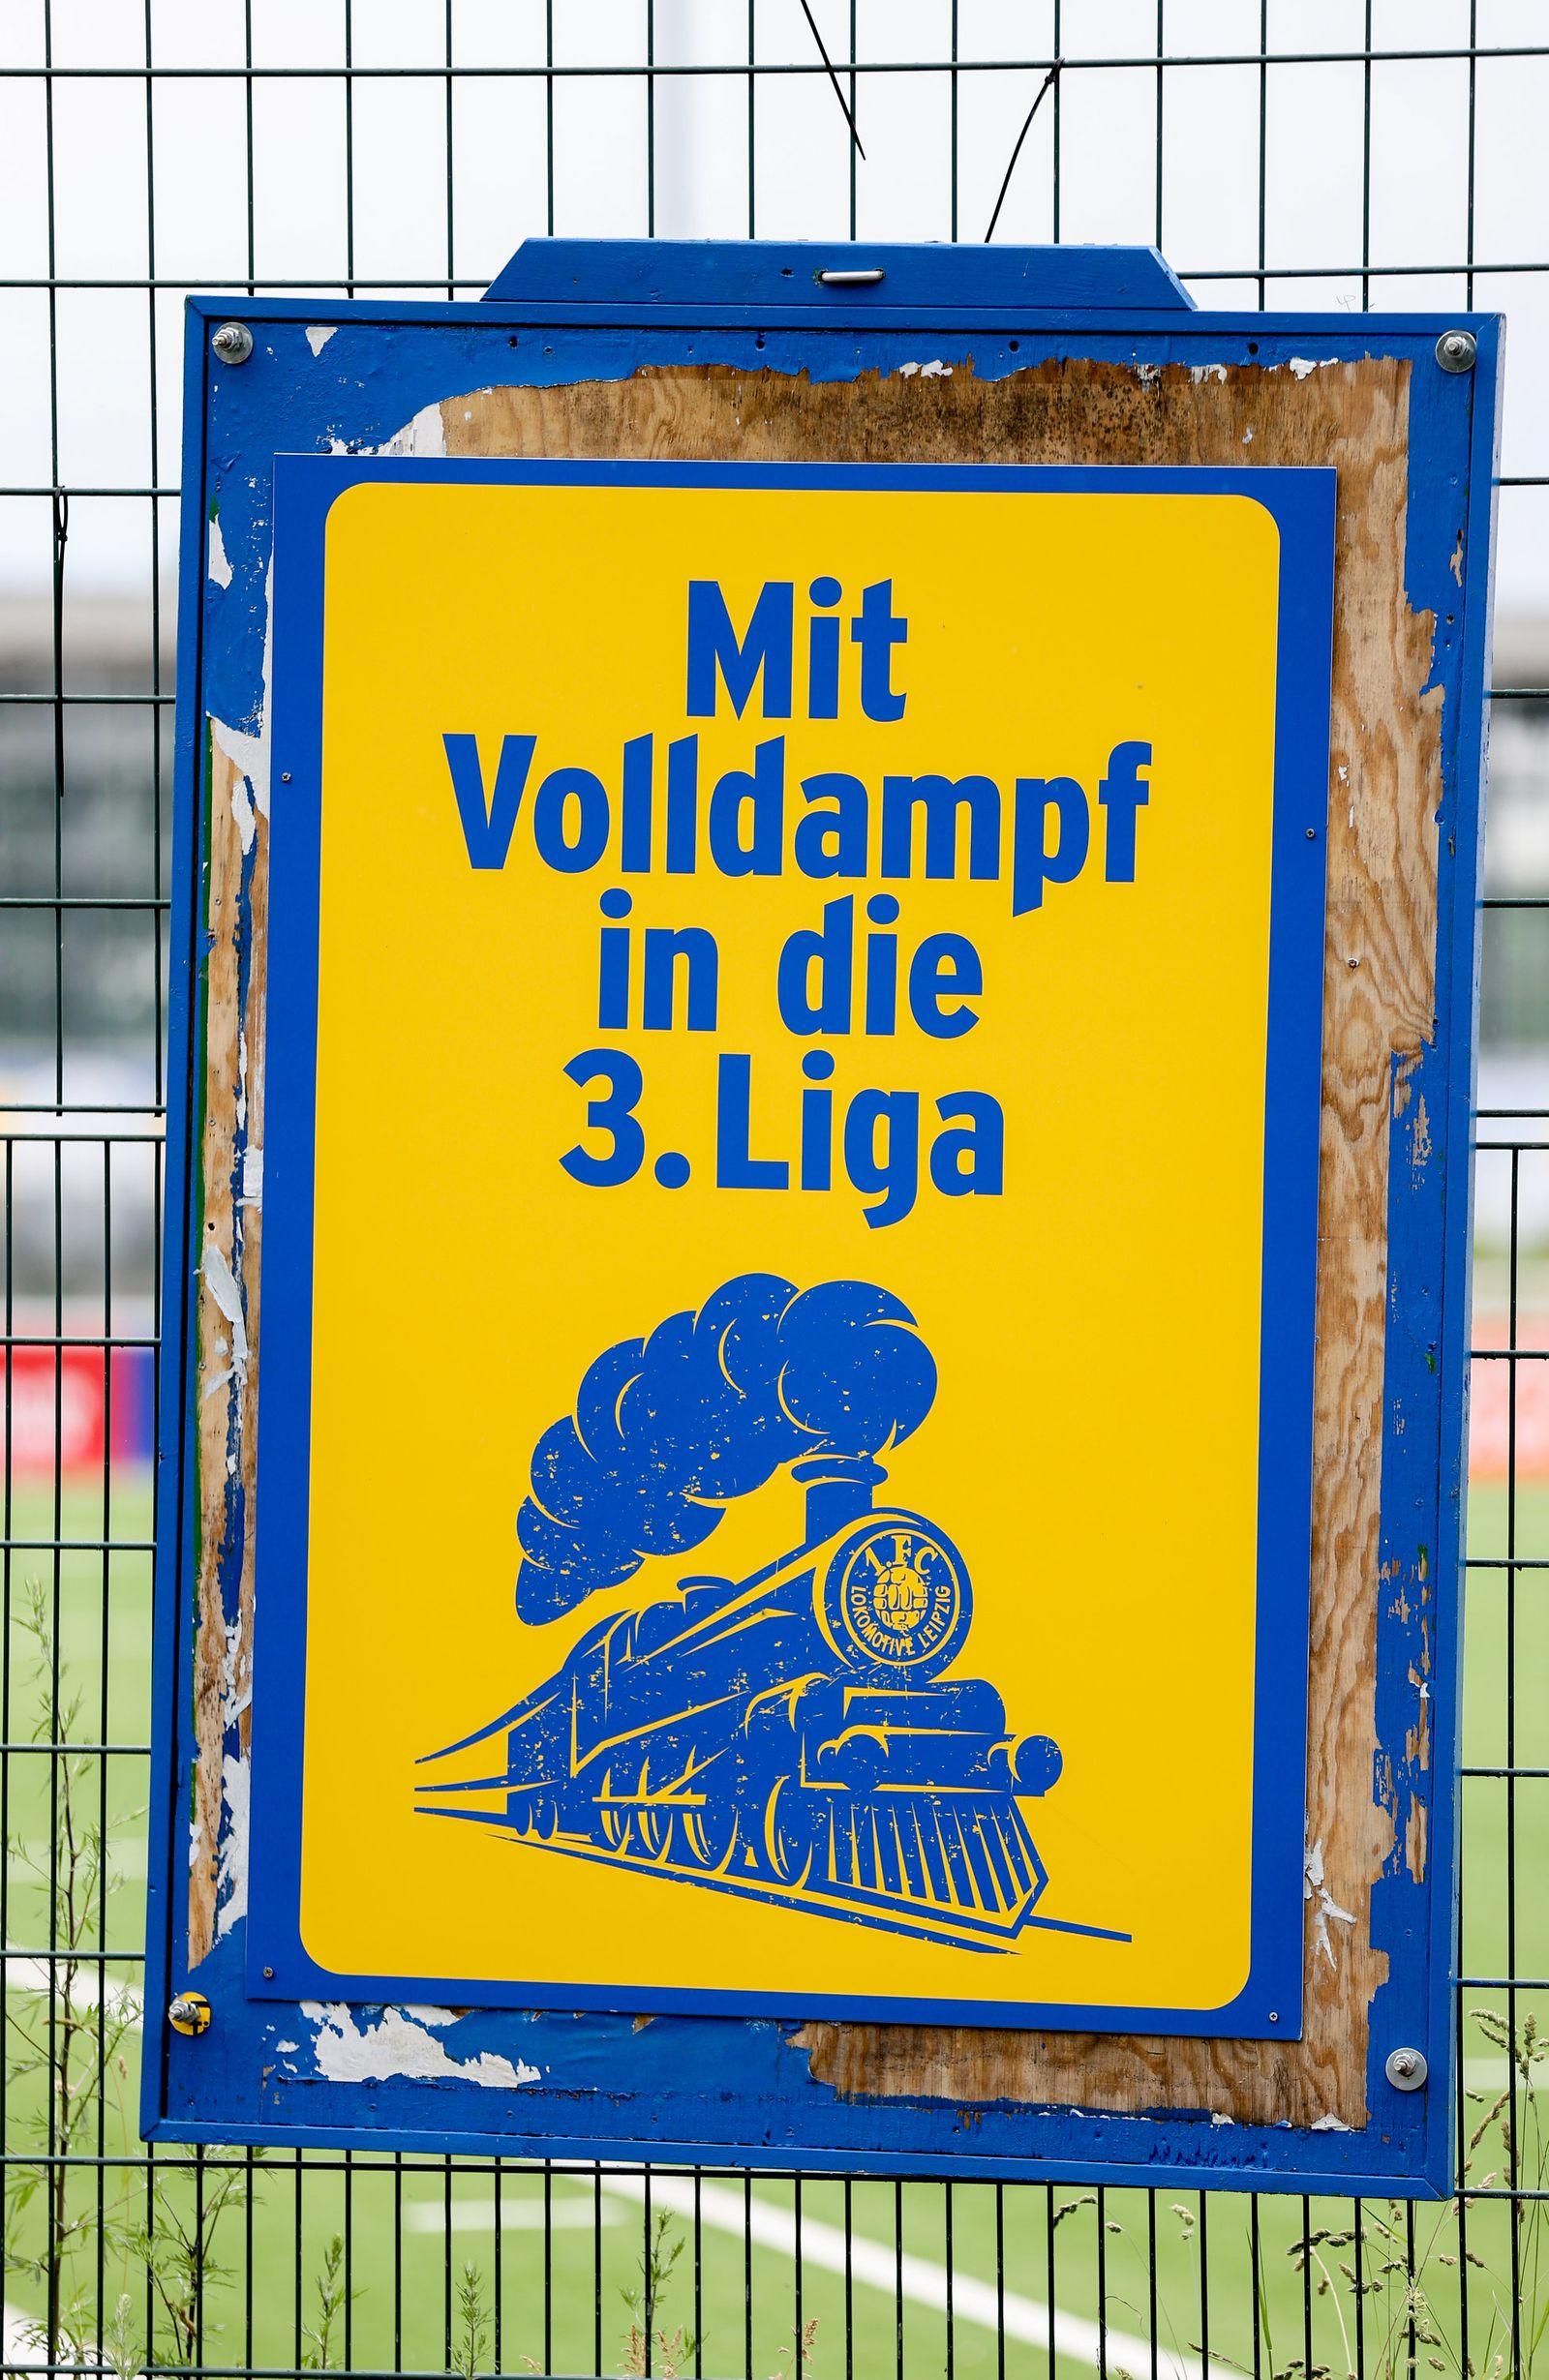 Lok Leipzig vor Relegationsspiel